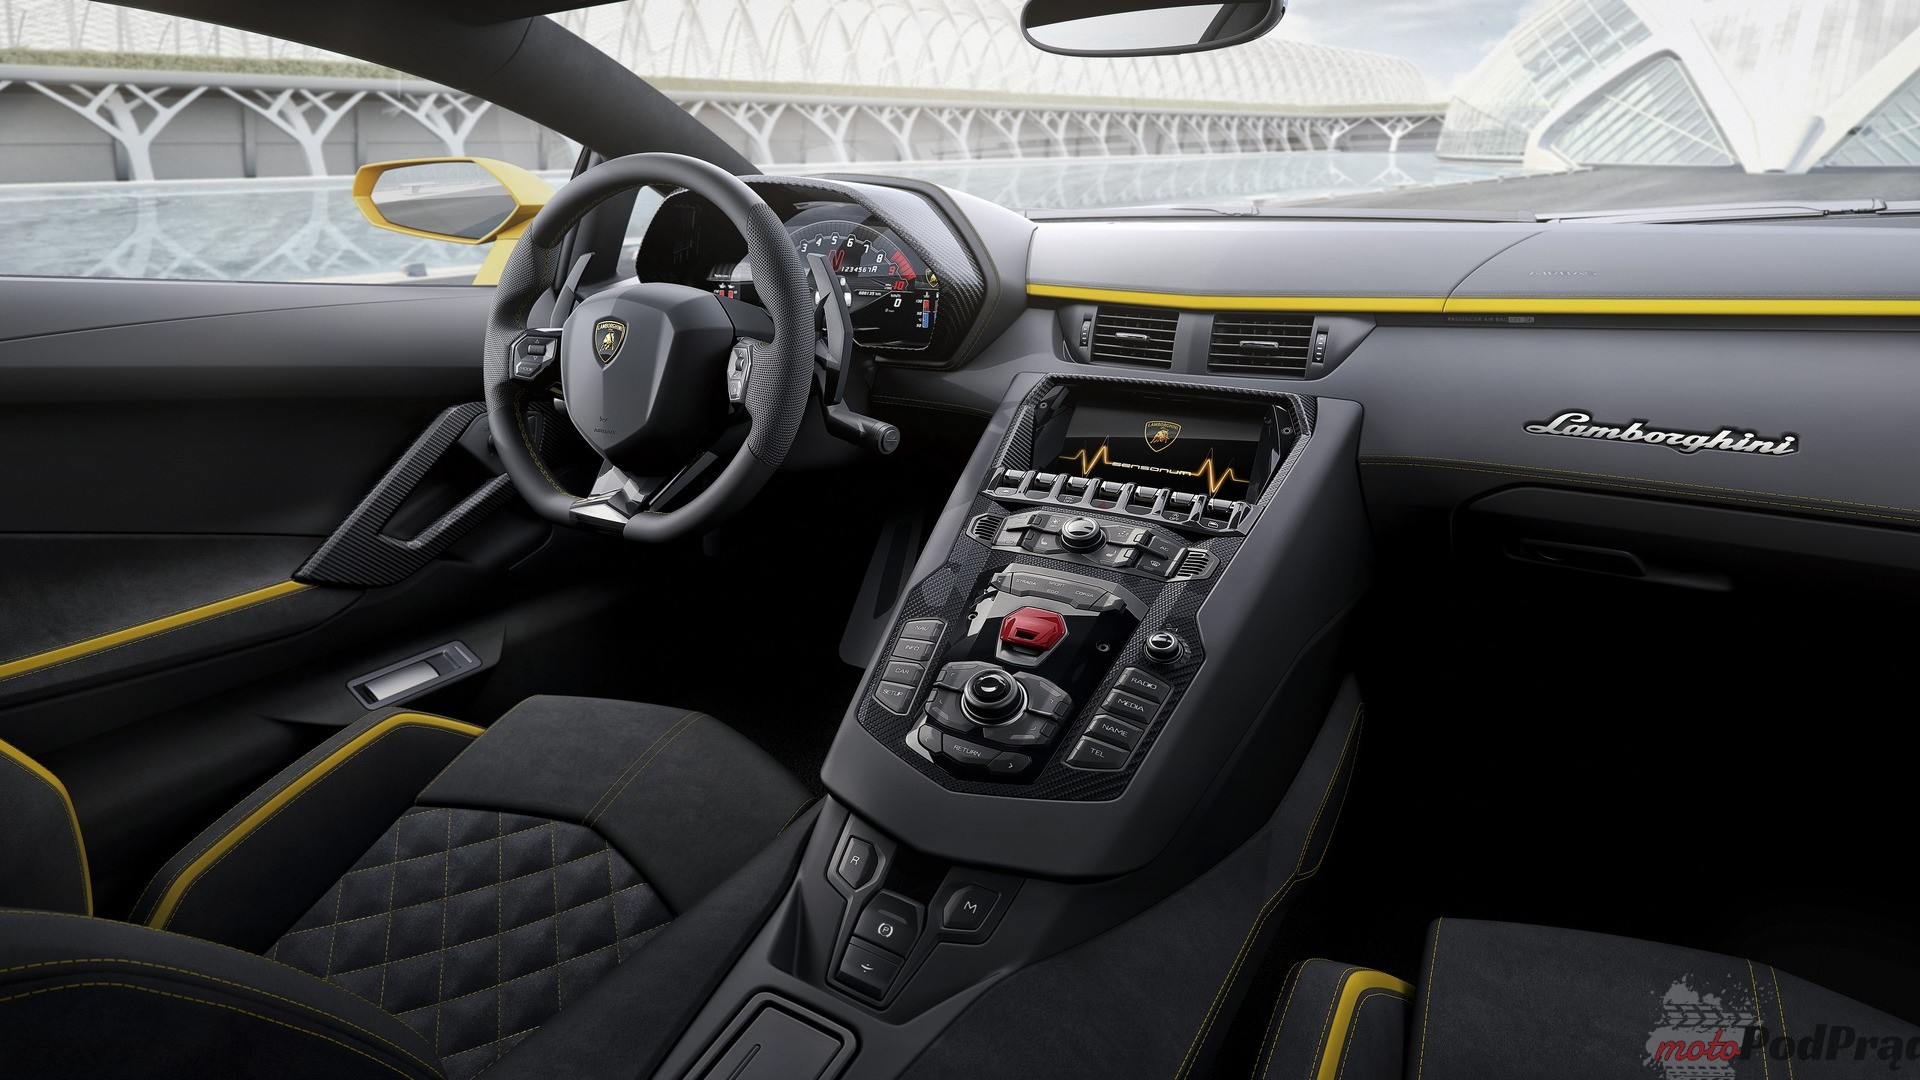 2017 lamborghini aventador s 1 Poprawić doskonałość: Lamborghini Aventador S